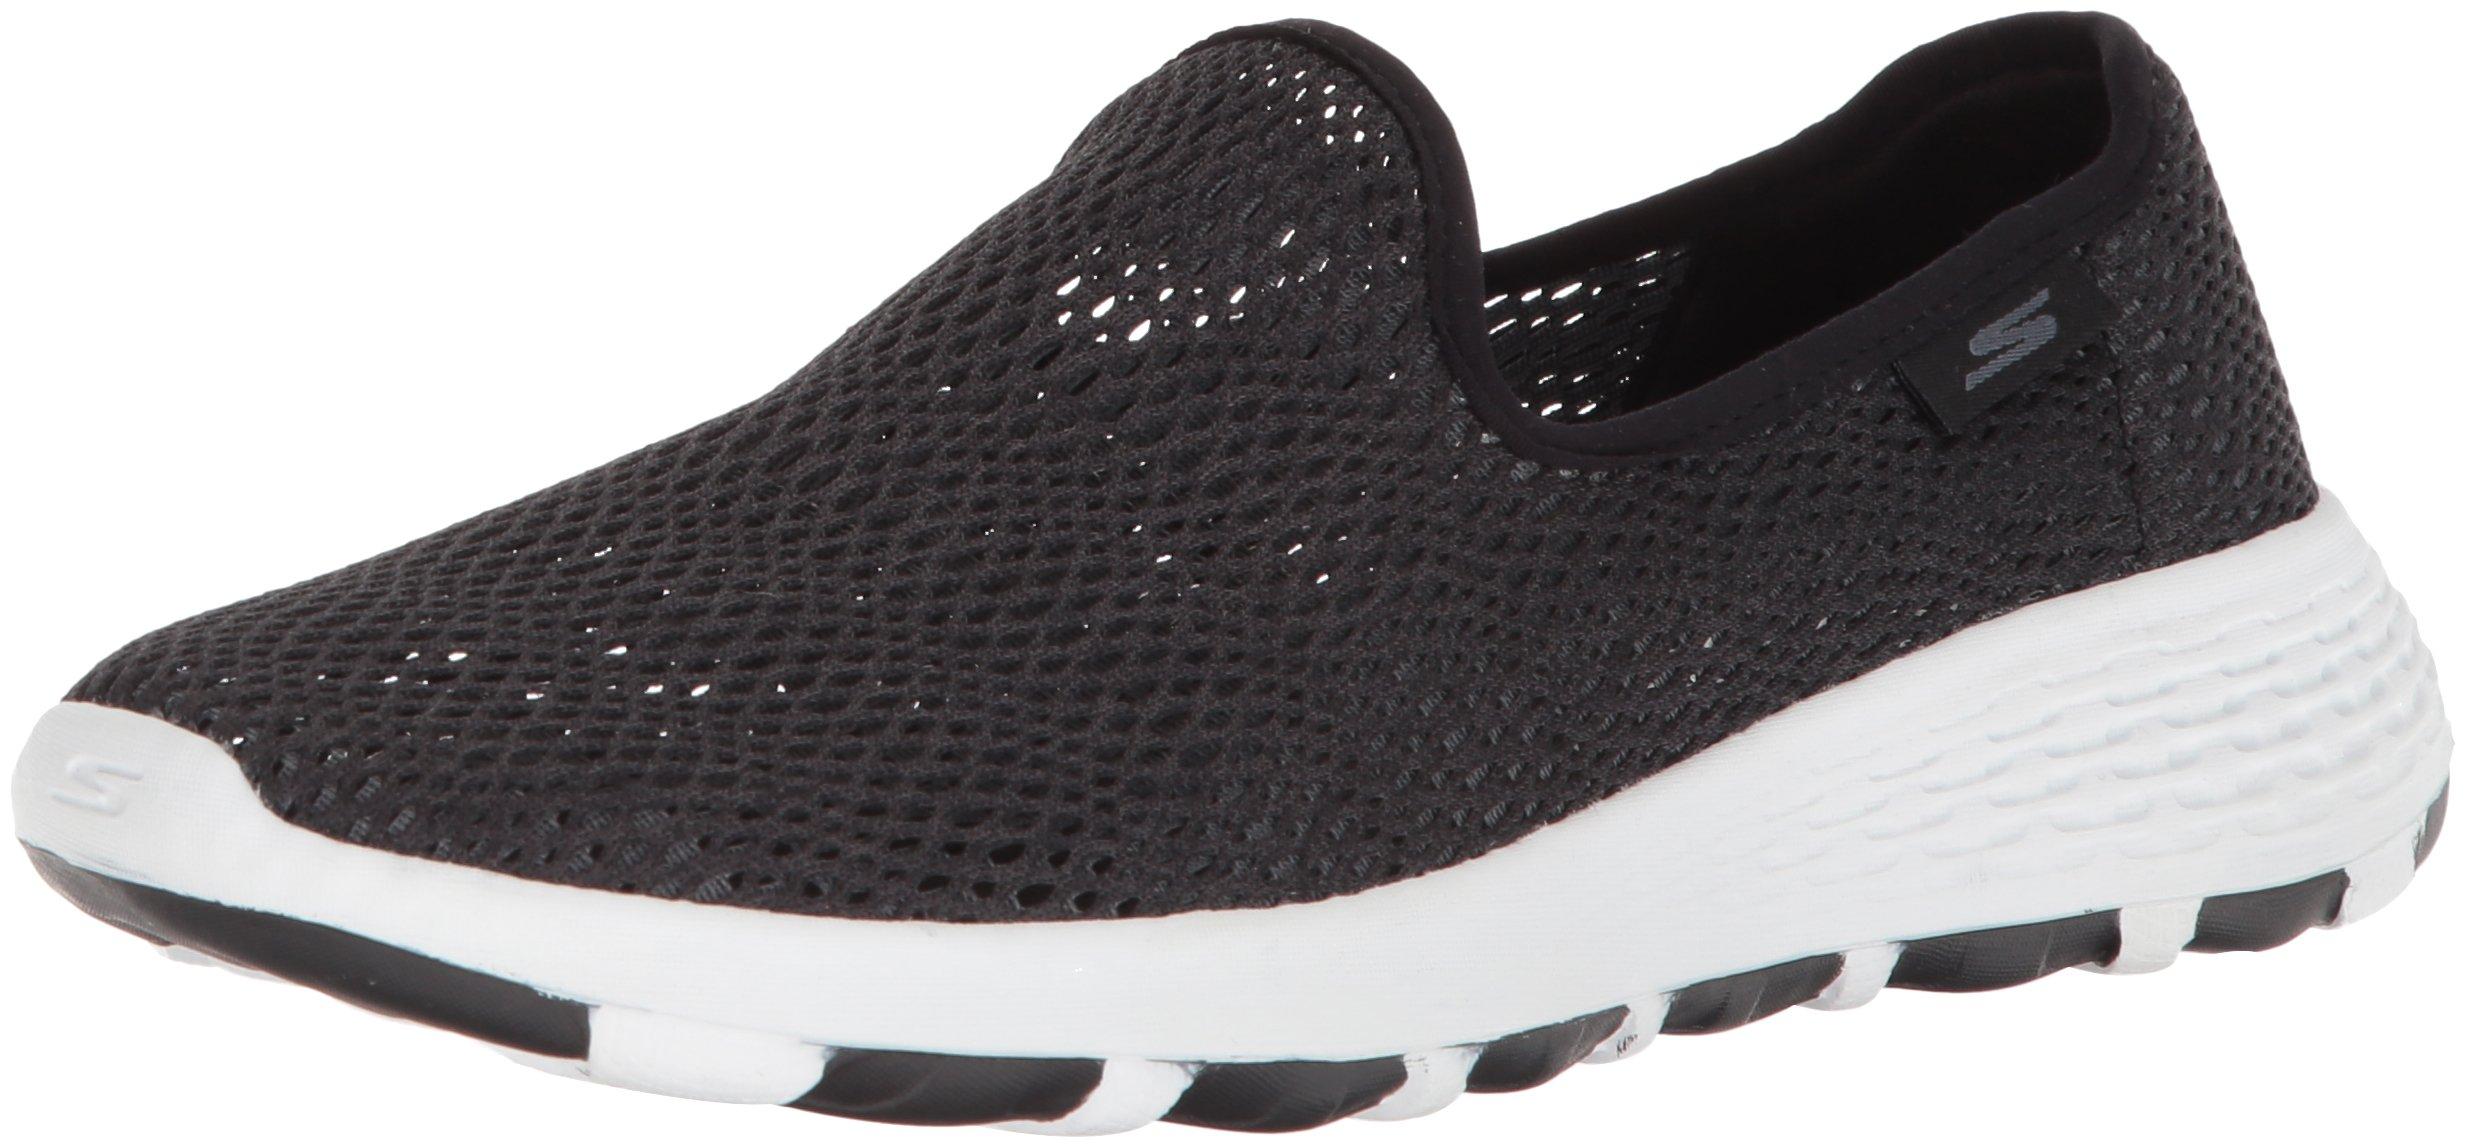 Skechers Performance Women's Go Walk Cool-15650 Sneaker,Black/White,8.5 M US